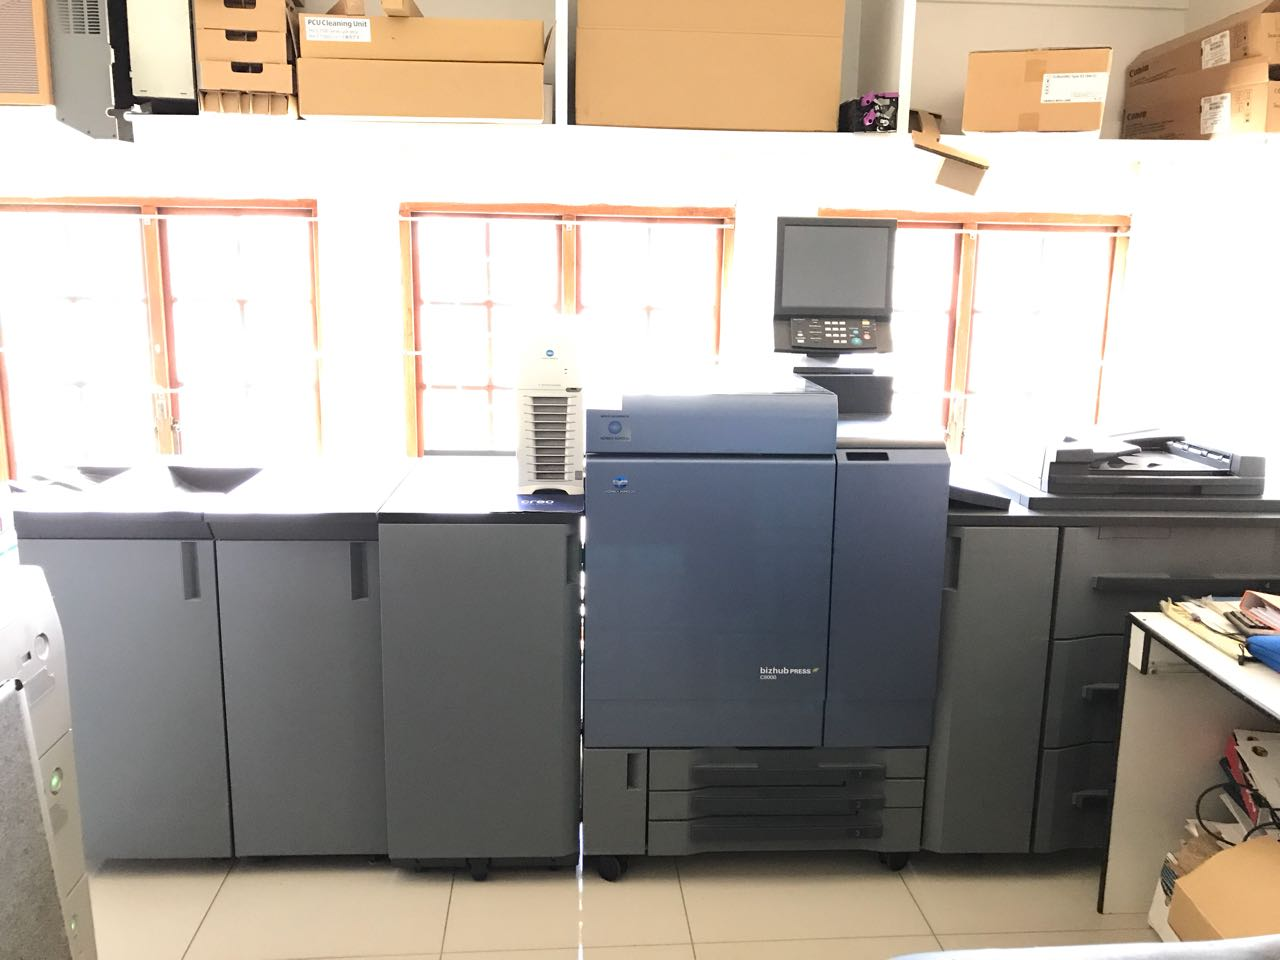 Konica Minolta C8000 copier for sale